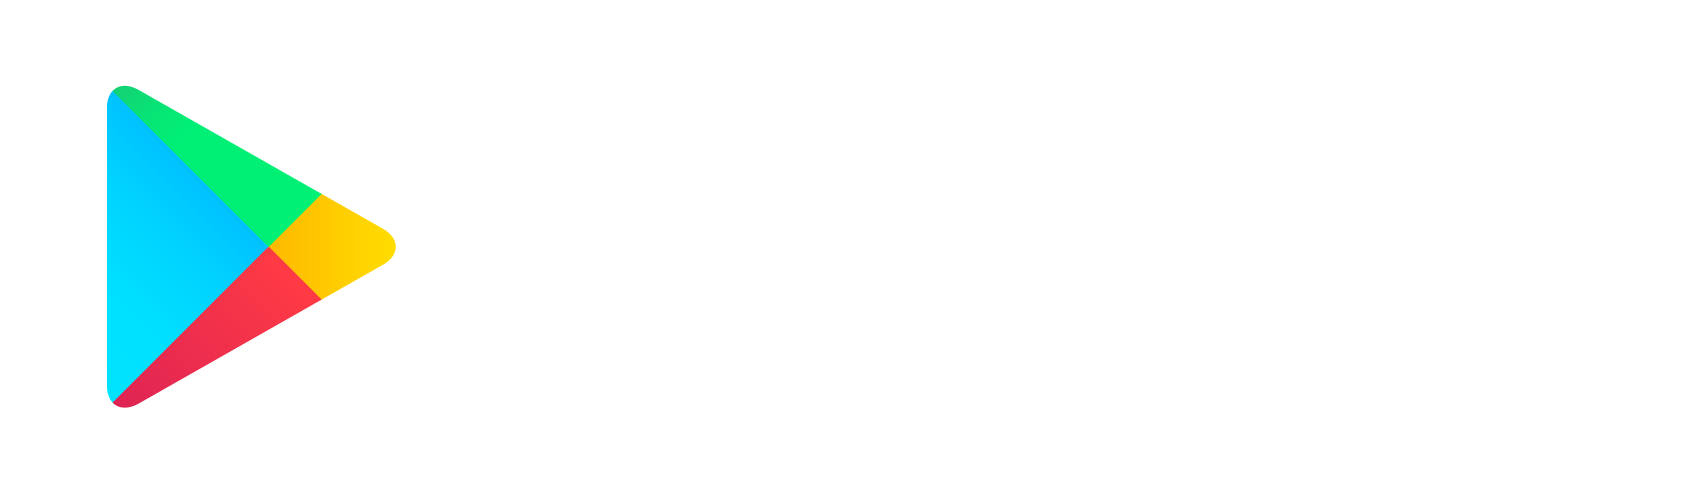 App Jobfie play store